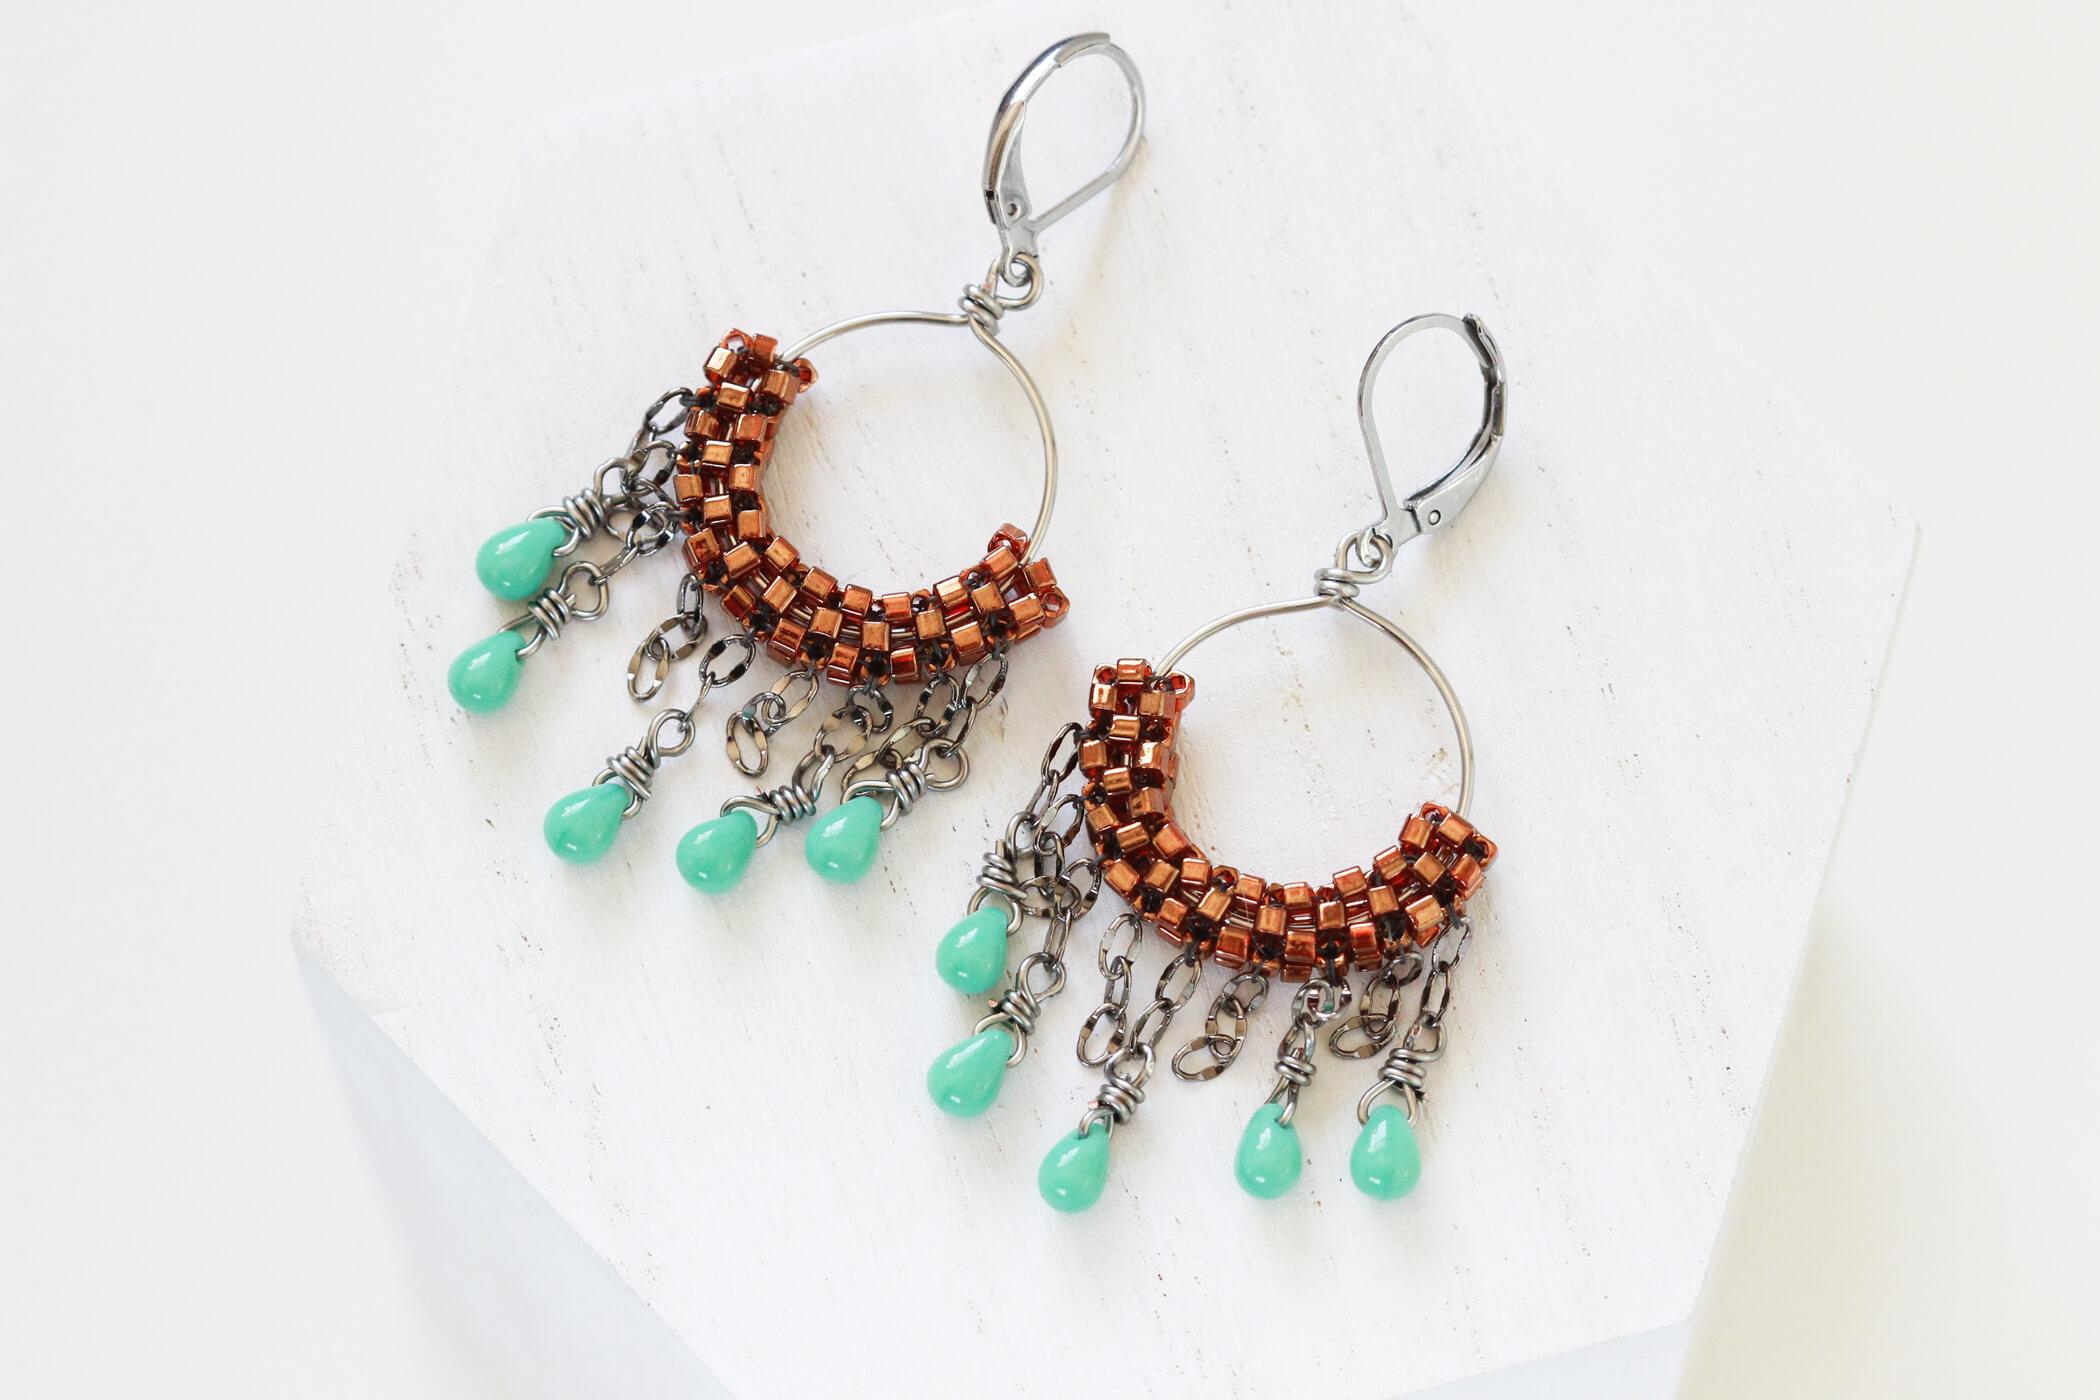 Copper Hoop Earrings – Hypoallergenic Earring Set by Kaleidoscopes And Polka Dots